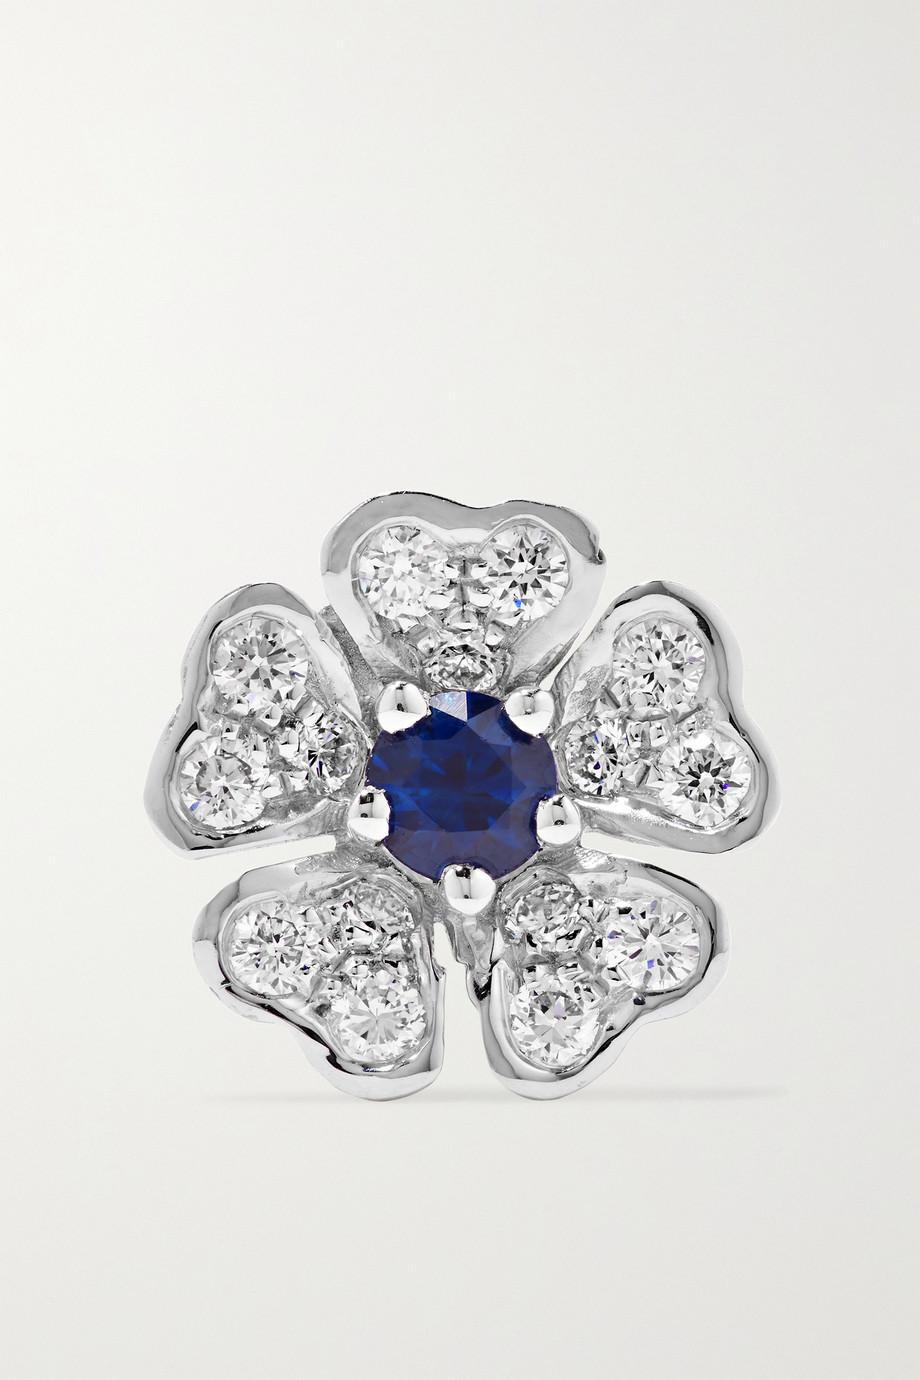 Maria Tash 8mm 18-karat white gold, diamond and sapphire earring